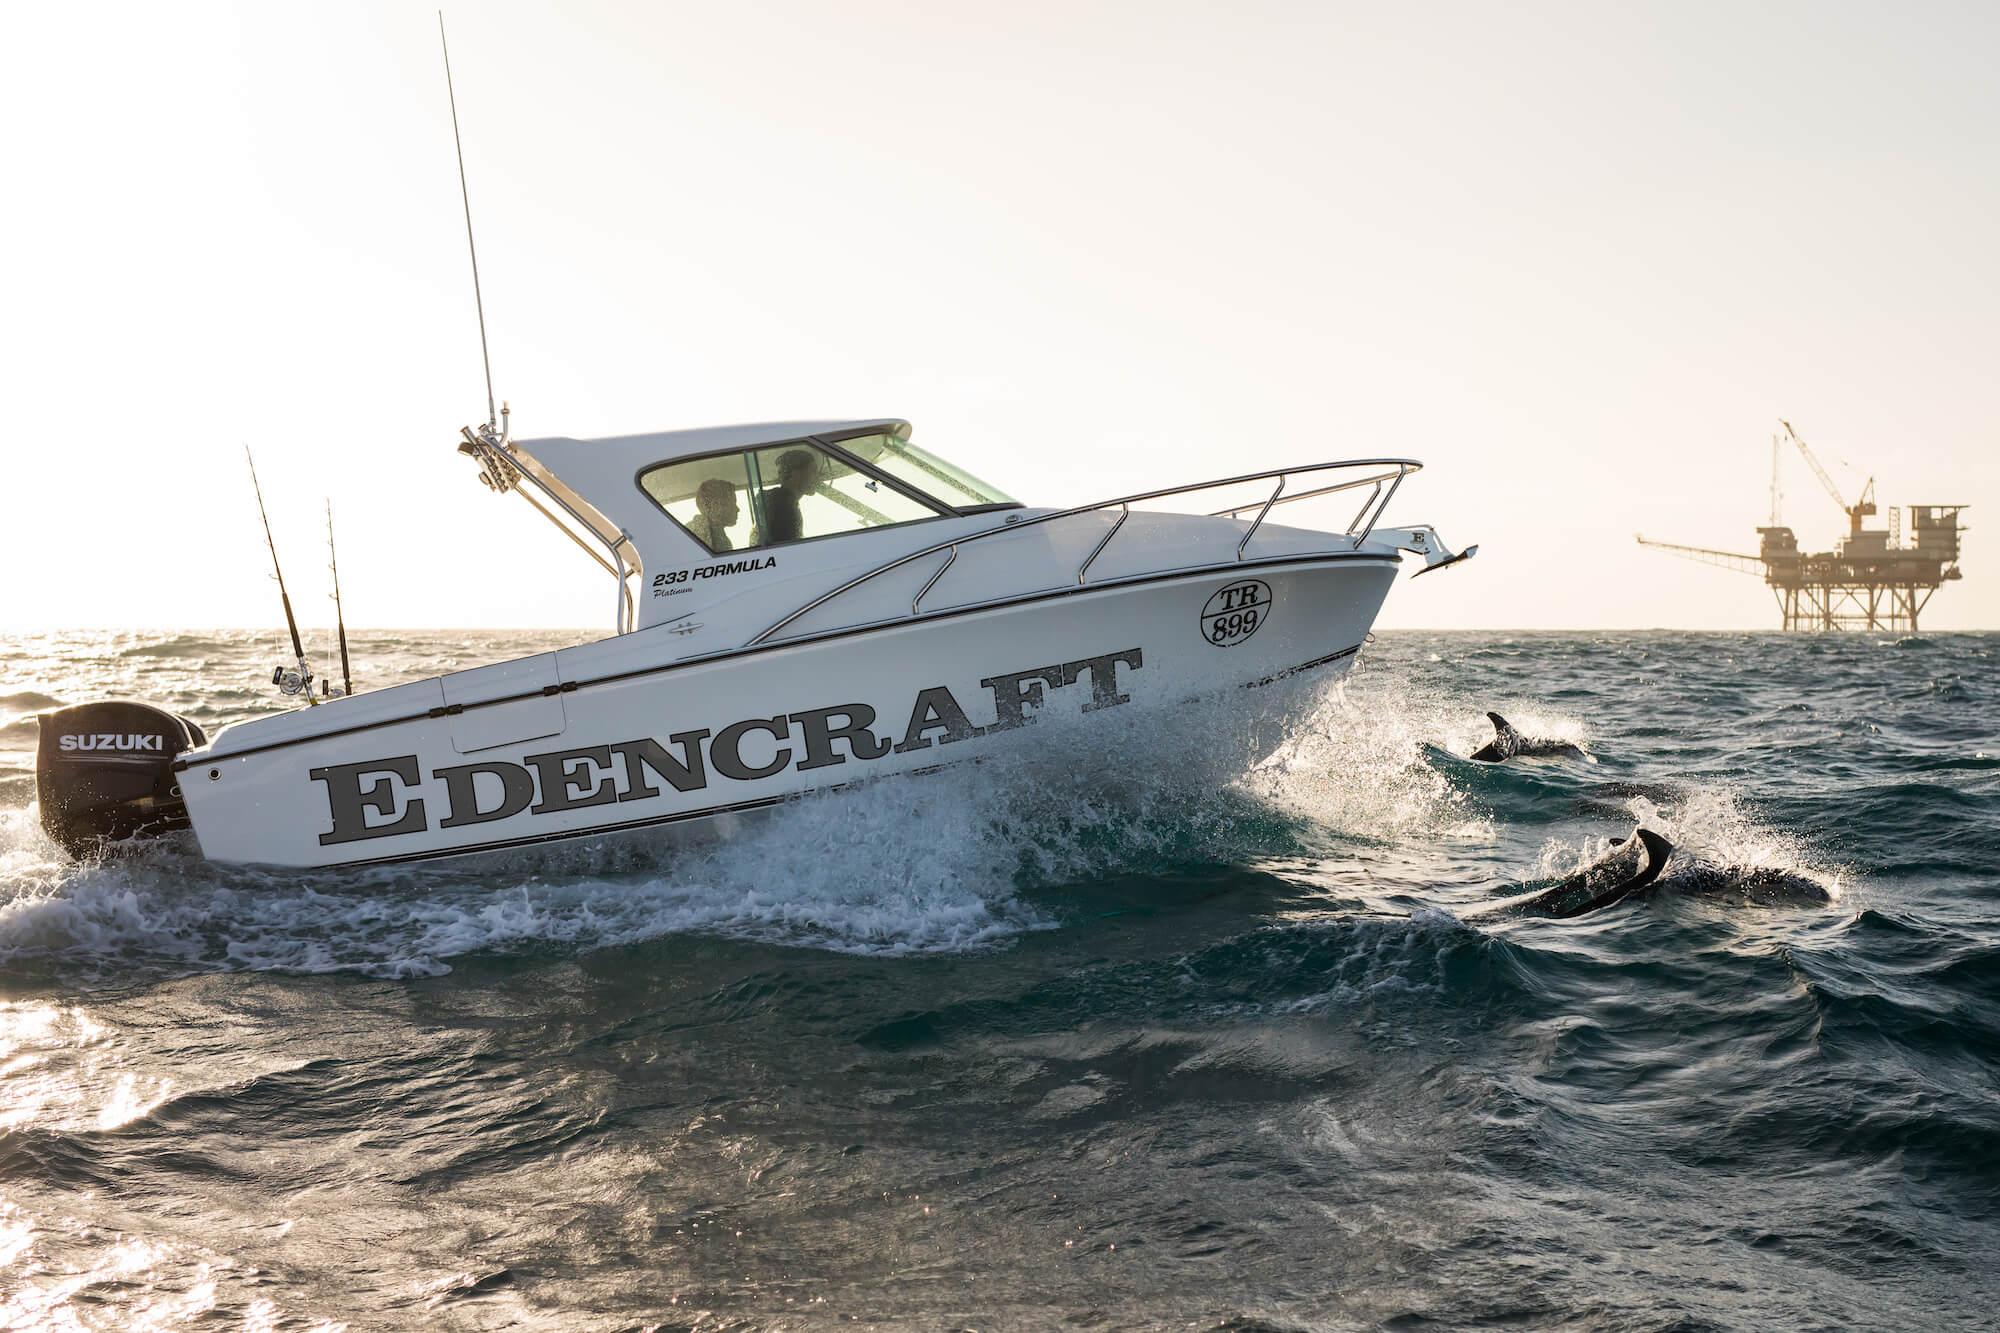 Dolphins swim alongside an Edencraft 233 Formula Platinum offshore